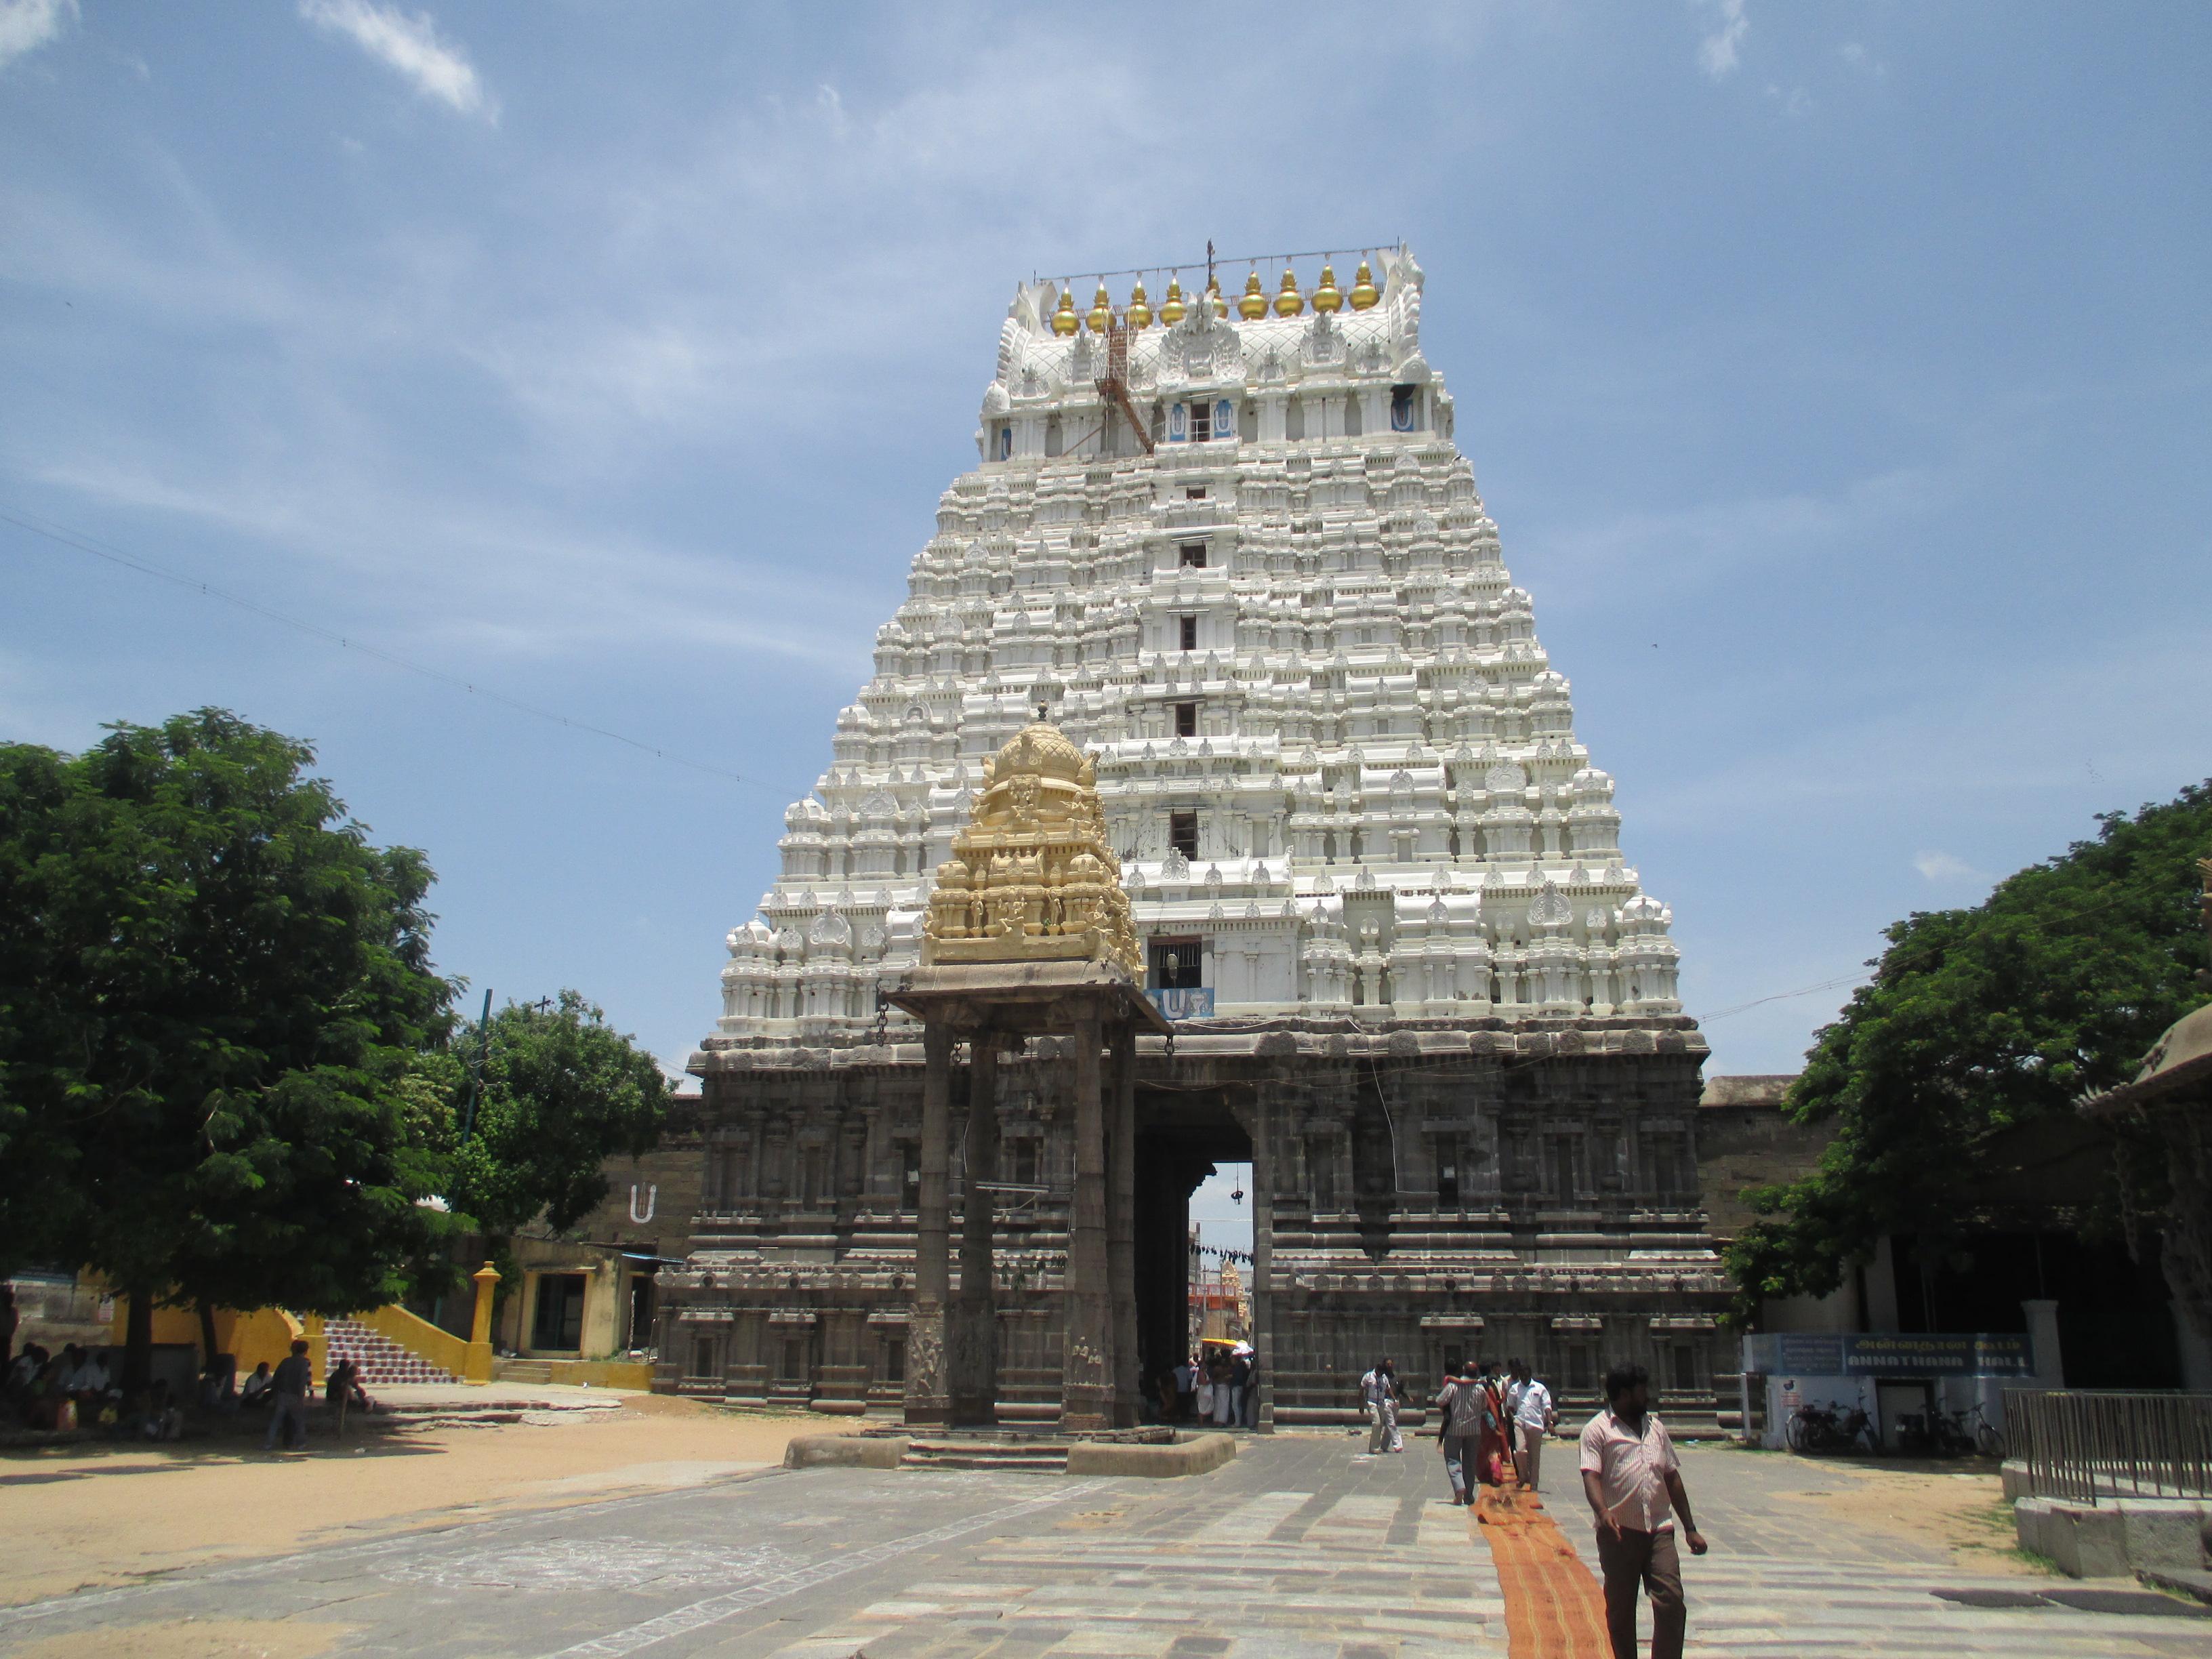 File:Varadaraja Perumal Temple Kanchipuram (2).jpg